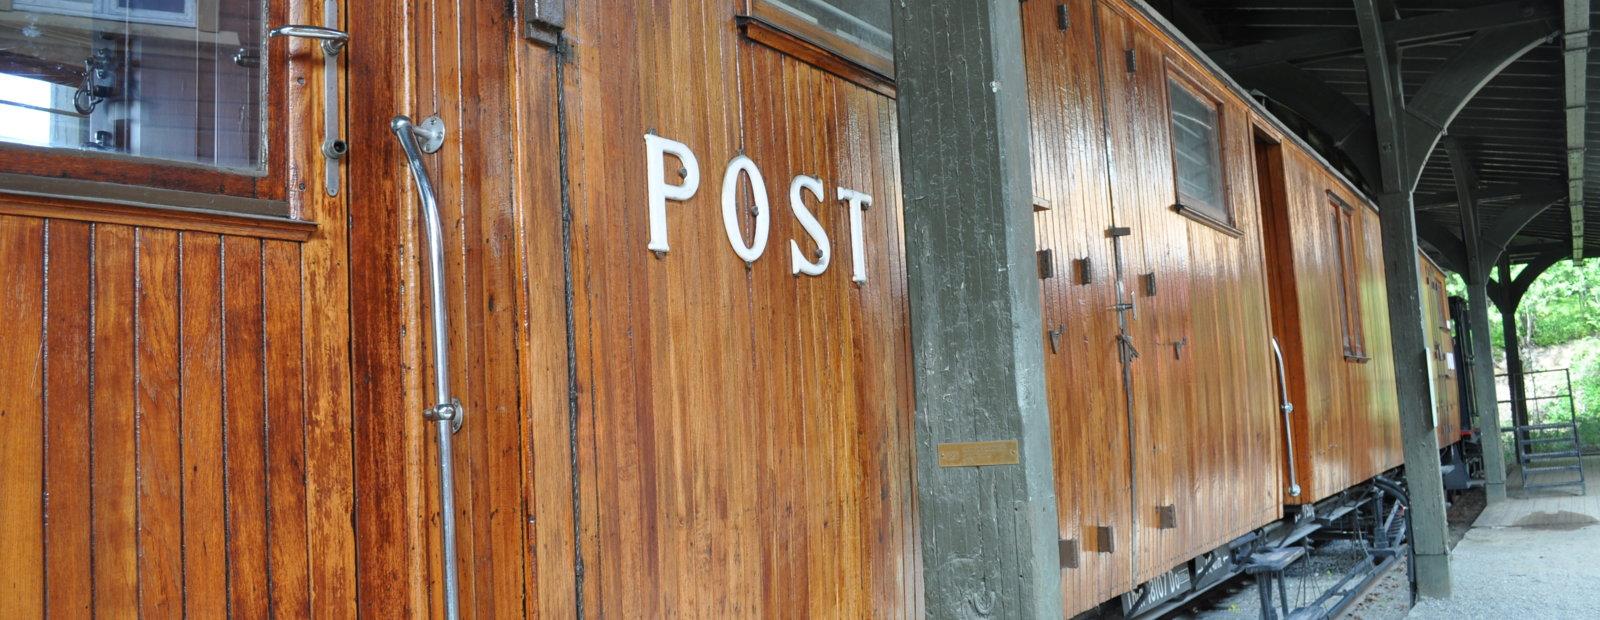 Post by Rail